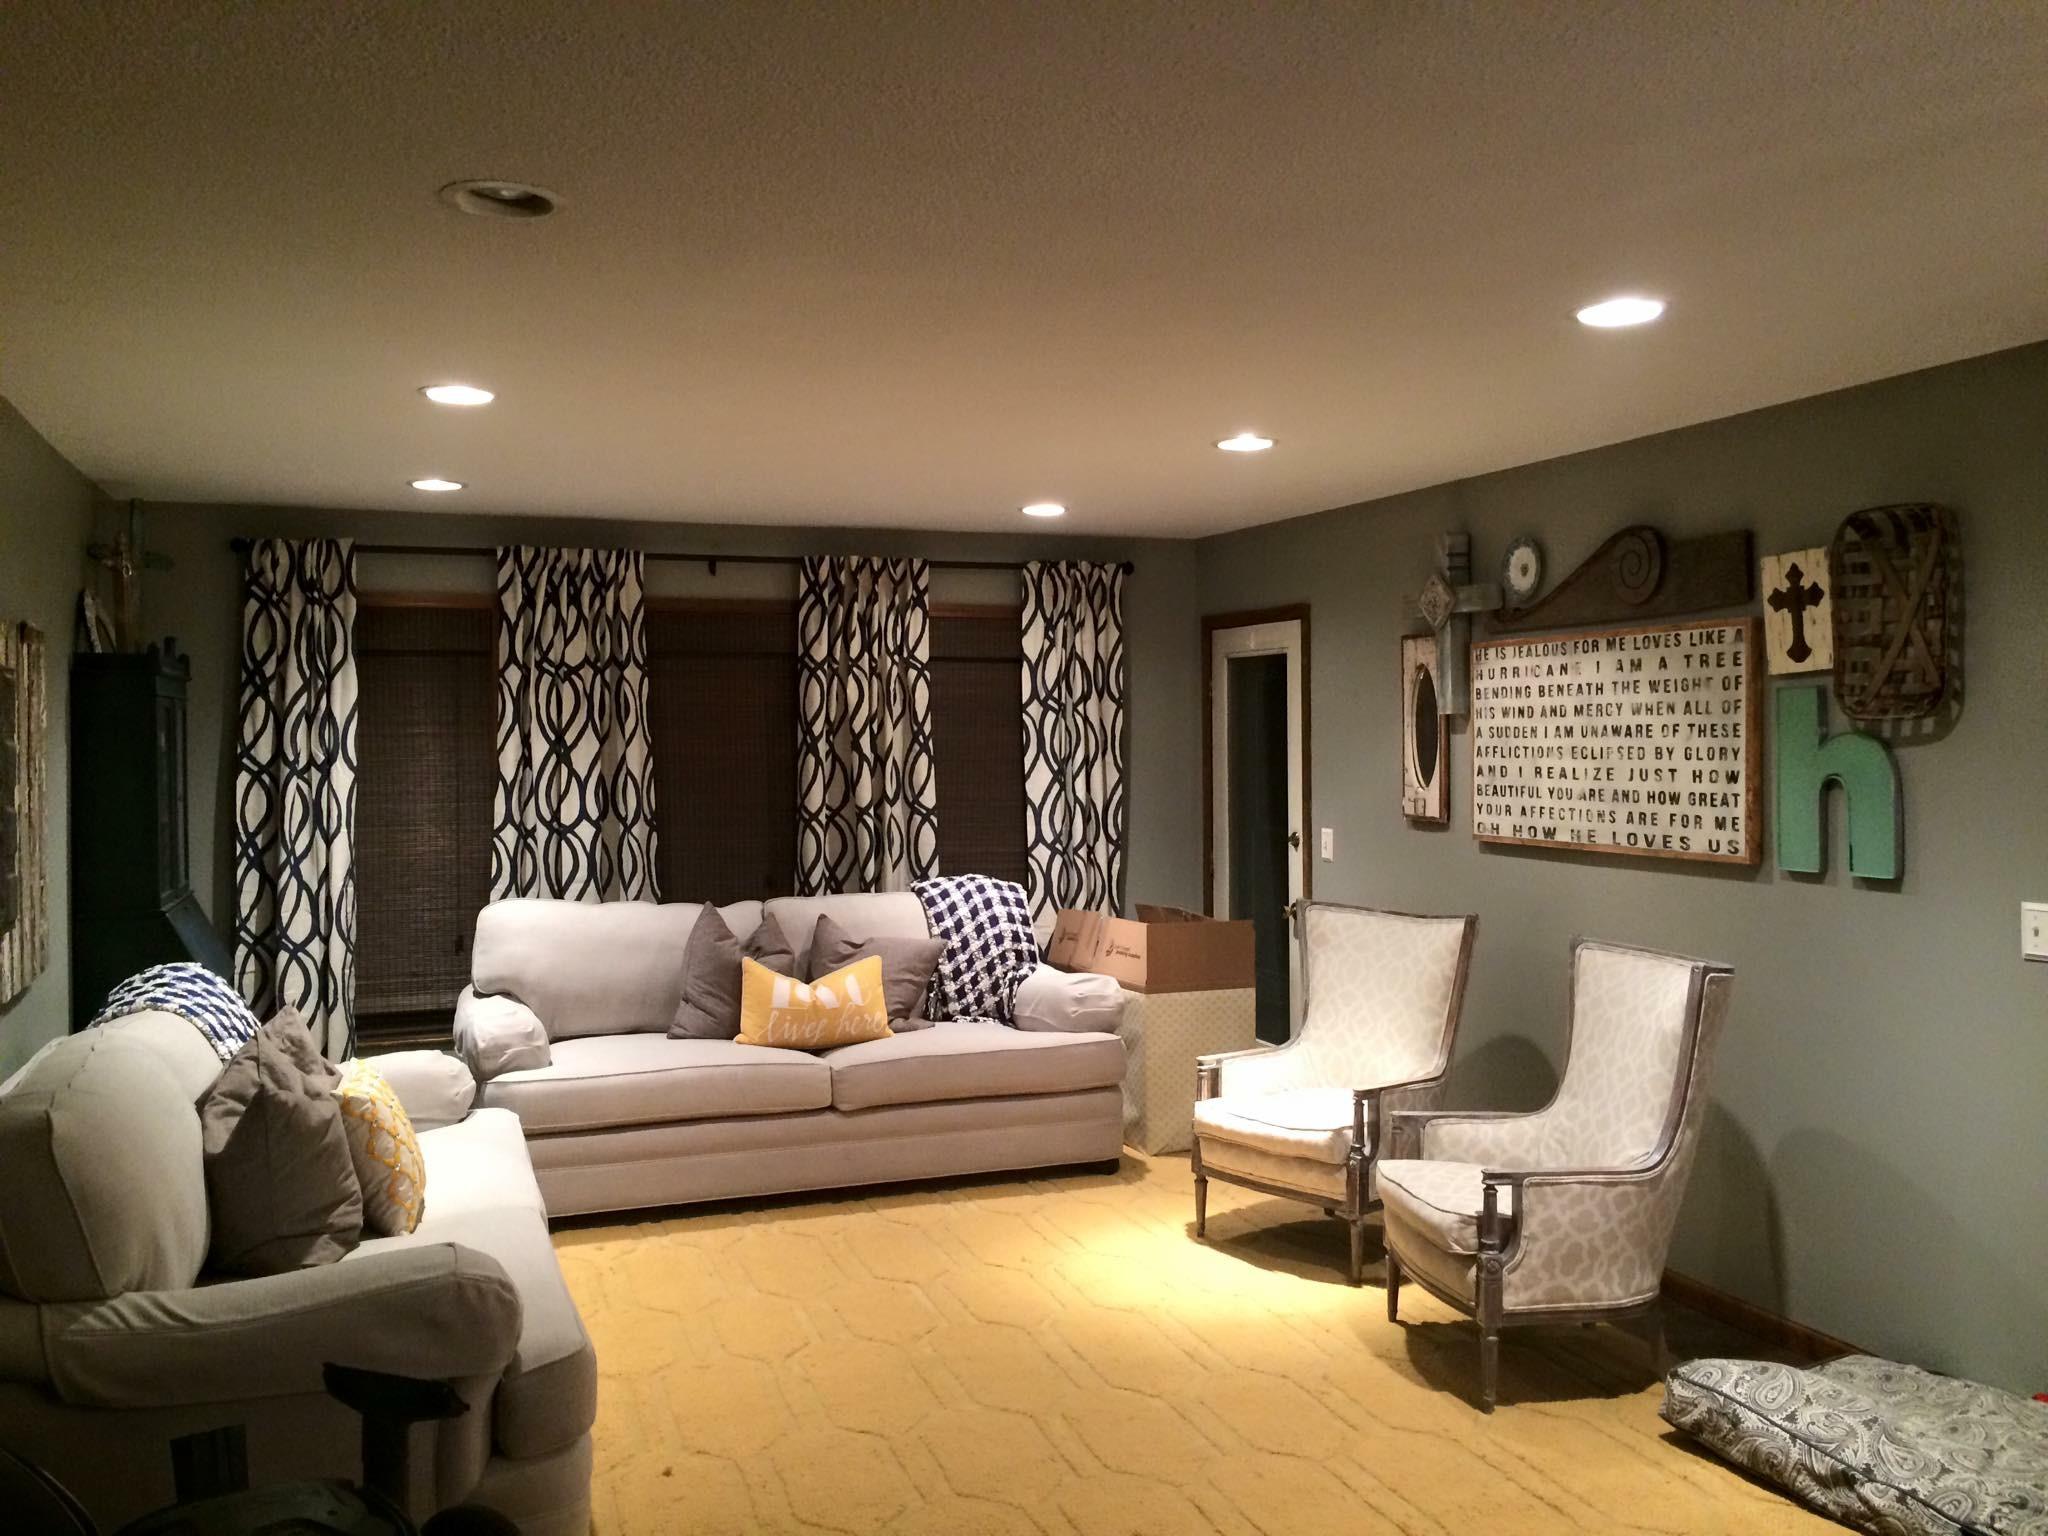 Home-Renovation-DIY-RE-Finished.png